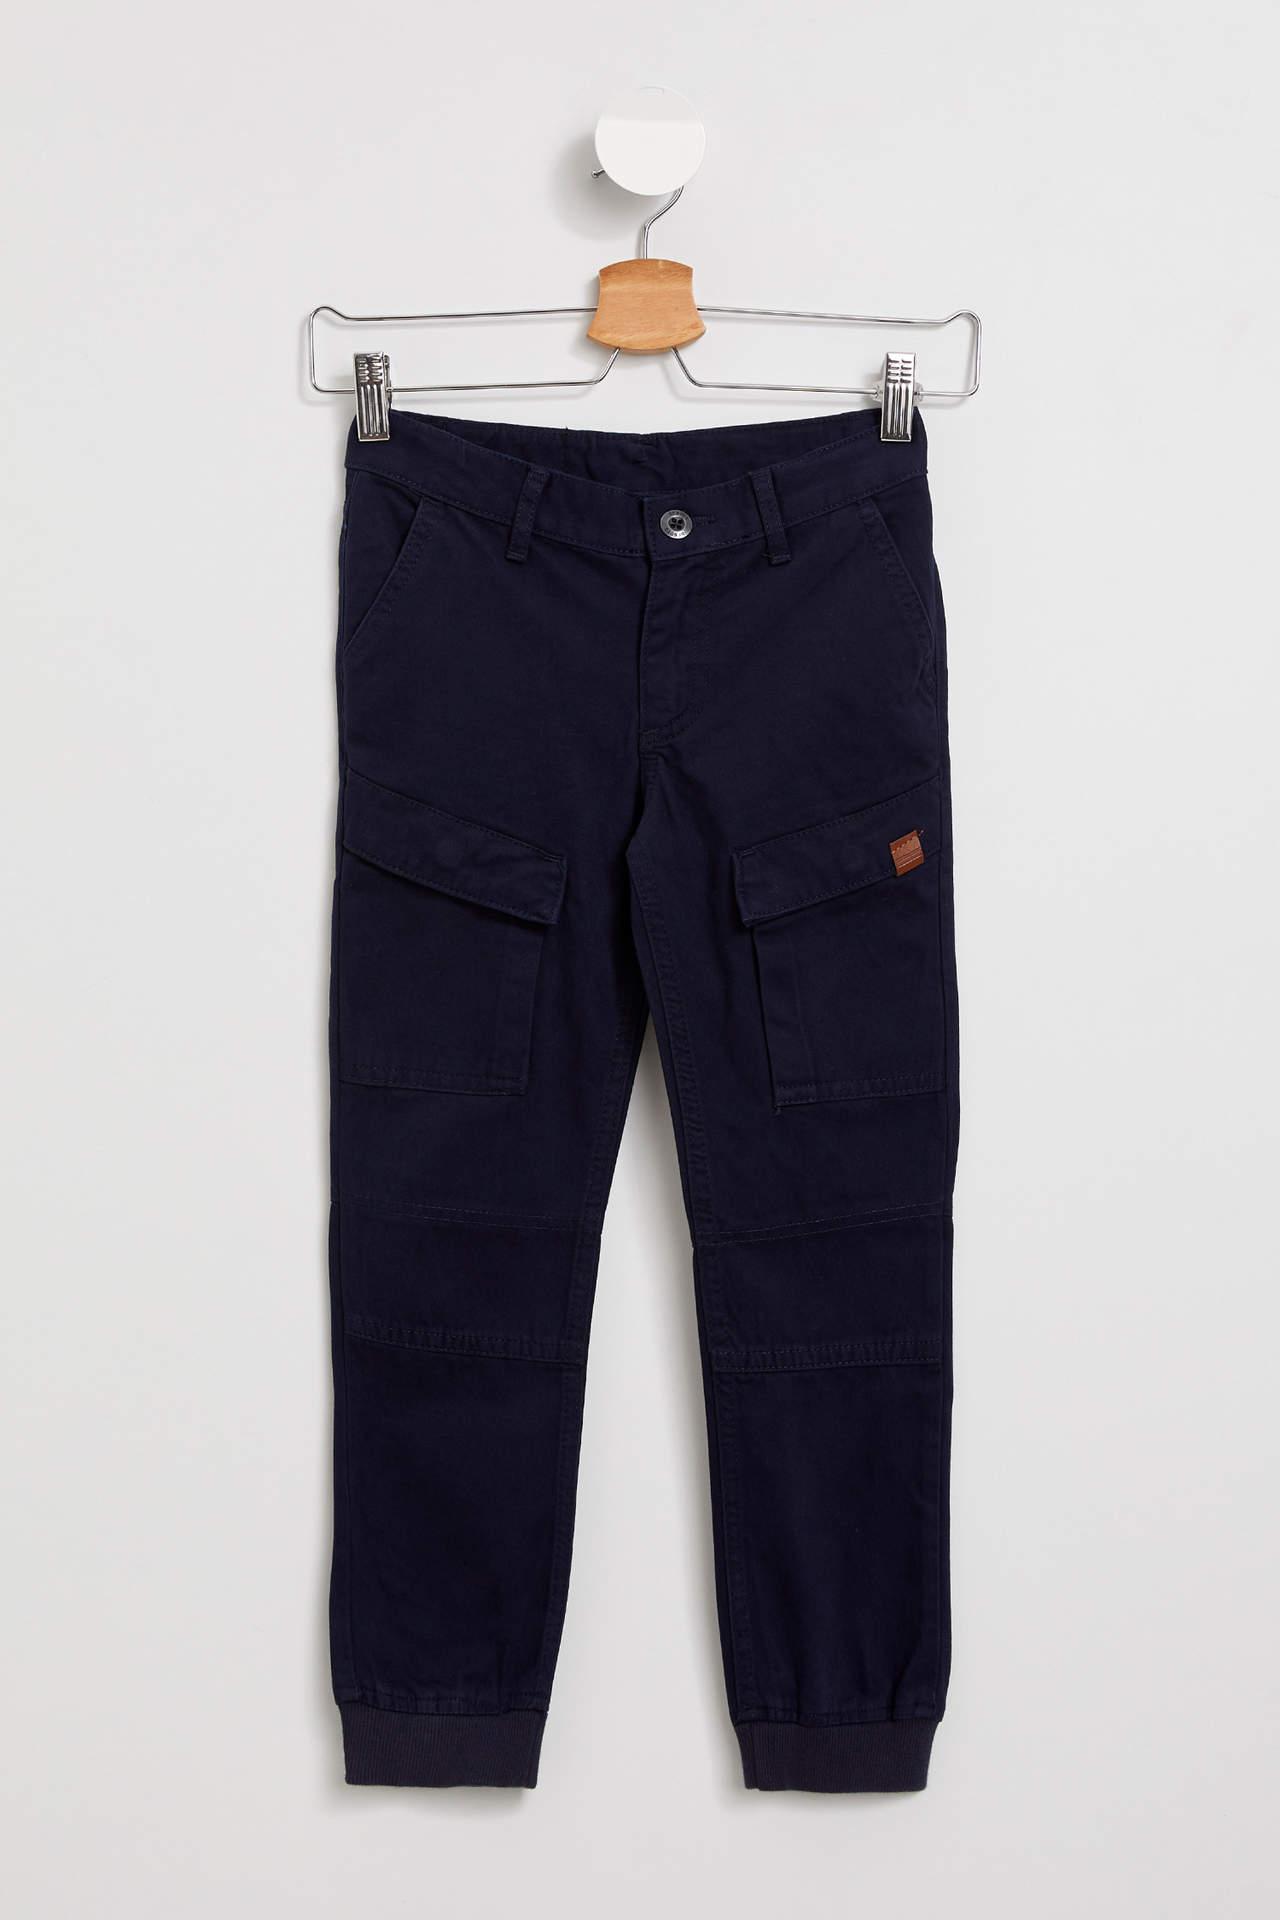 DeFacto Erkek Çocuk Kargo Fit Jogger Pantolon Mavi male